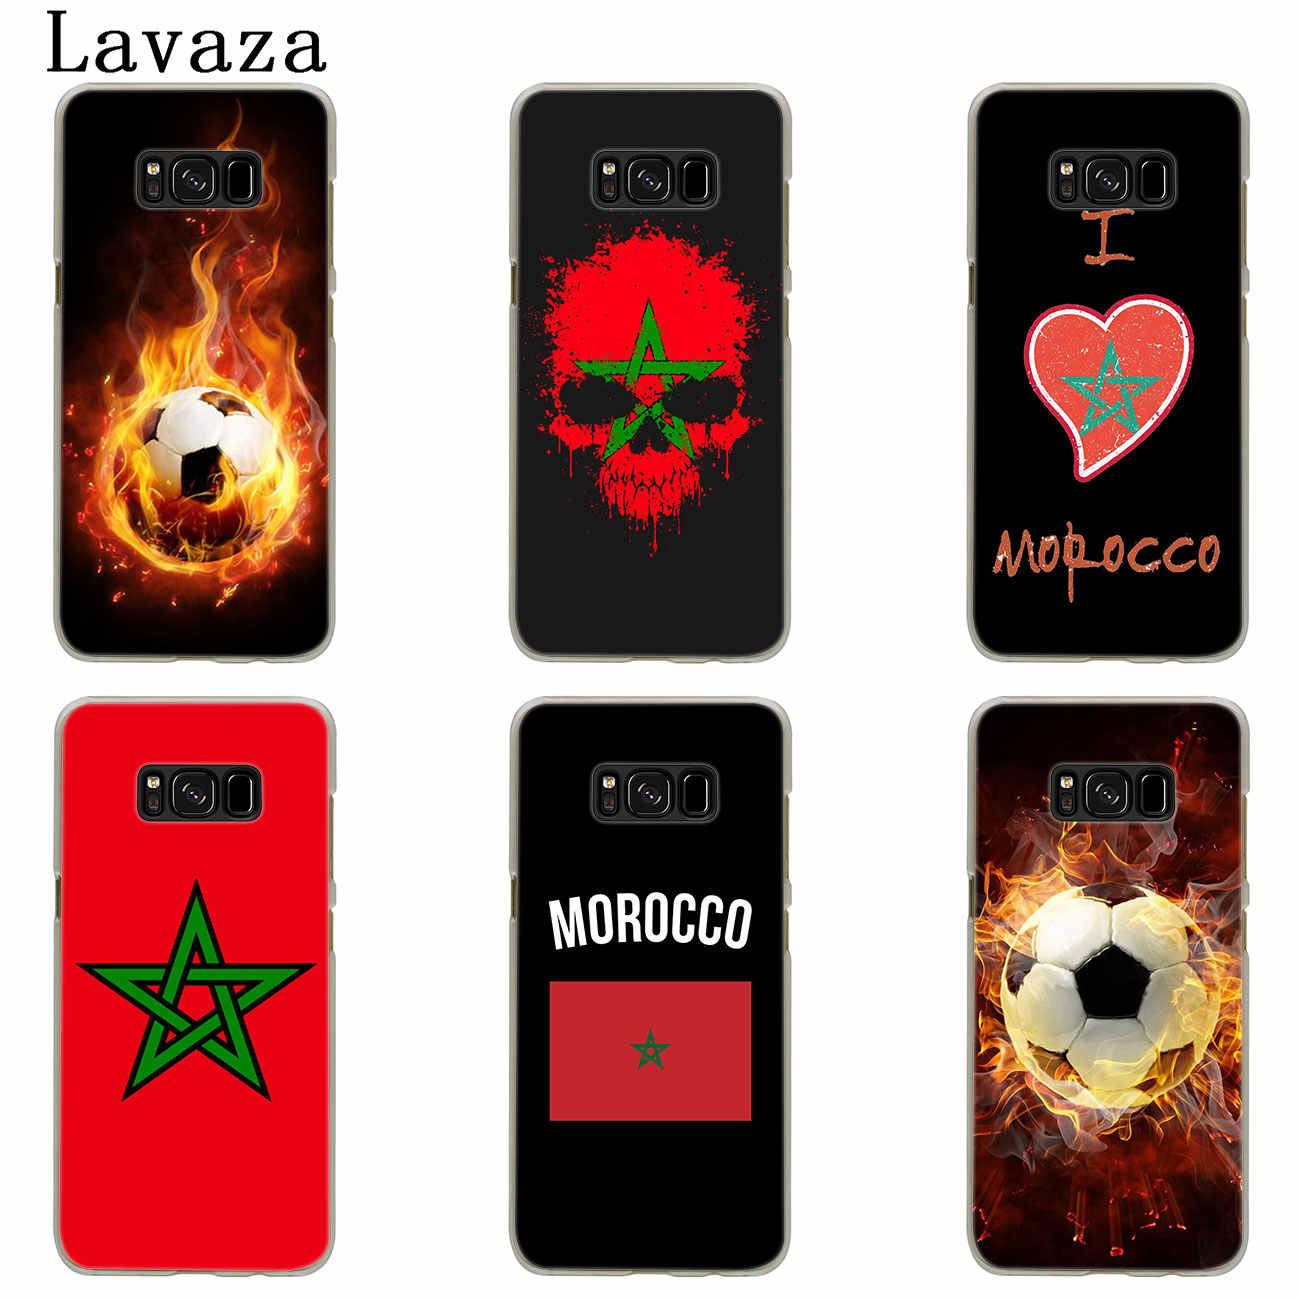 Lavaza מרוקו דגל כדורגל כדורגל טלפון מקרה לסמסונג גלקסי S20 Ultra S10 לייט S10E S6 S7 קצה S8 S9 בתוספת A51 A71 A81 A91